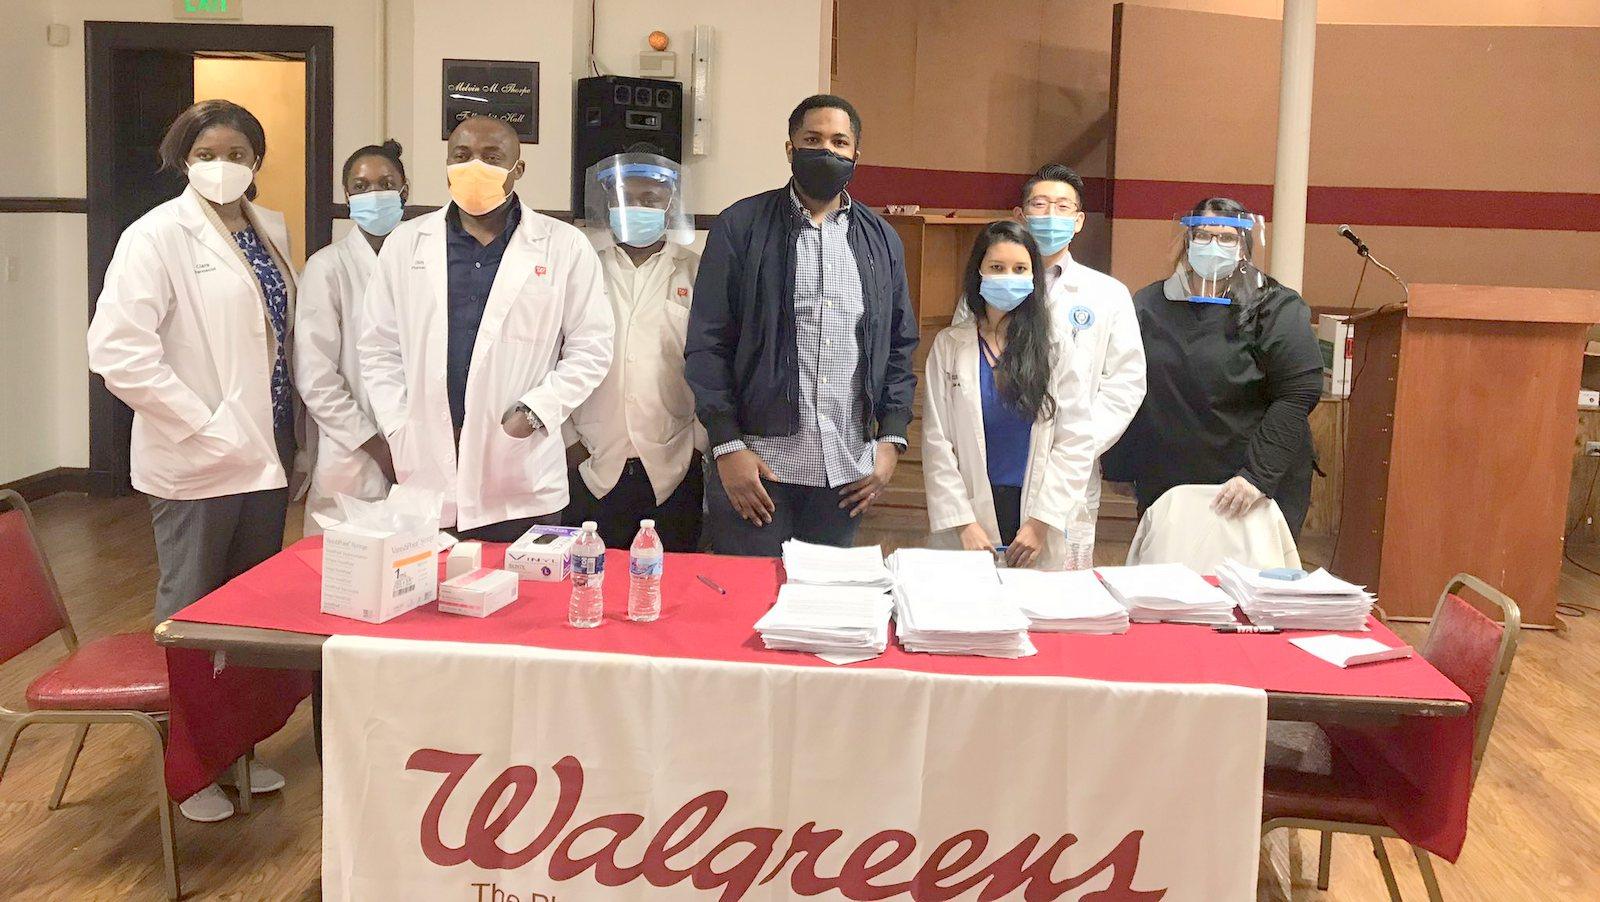 Del. Marlon Amprey with vaccine clinic staff. (@marlonamprey)